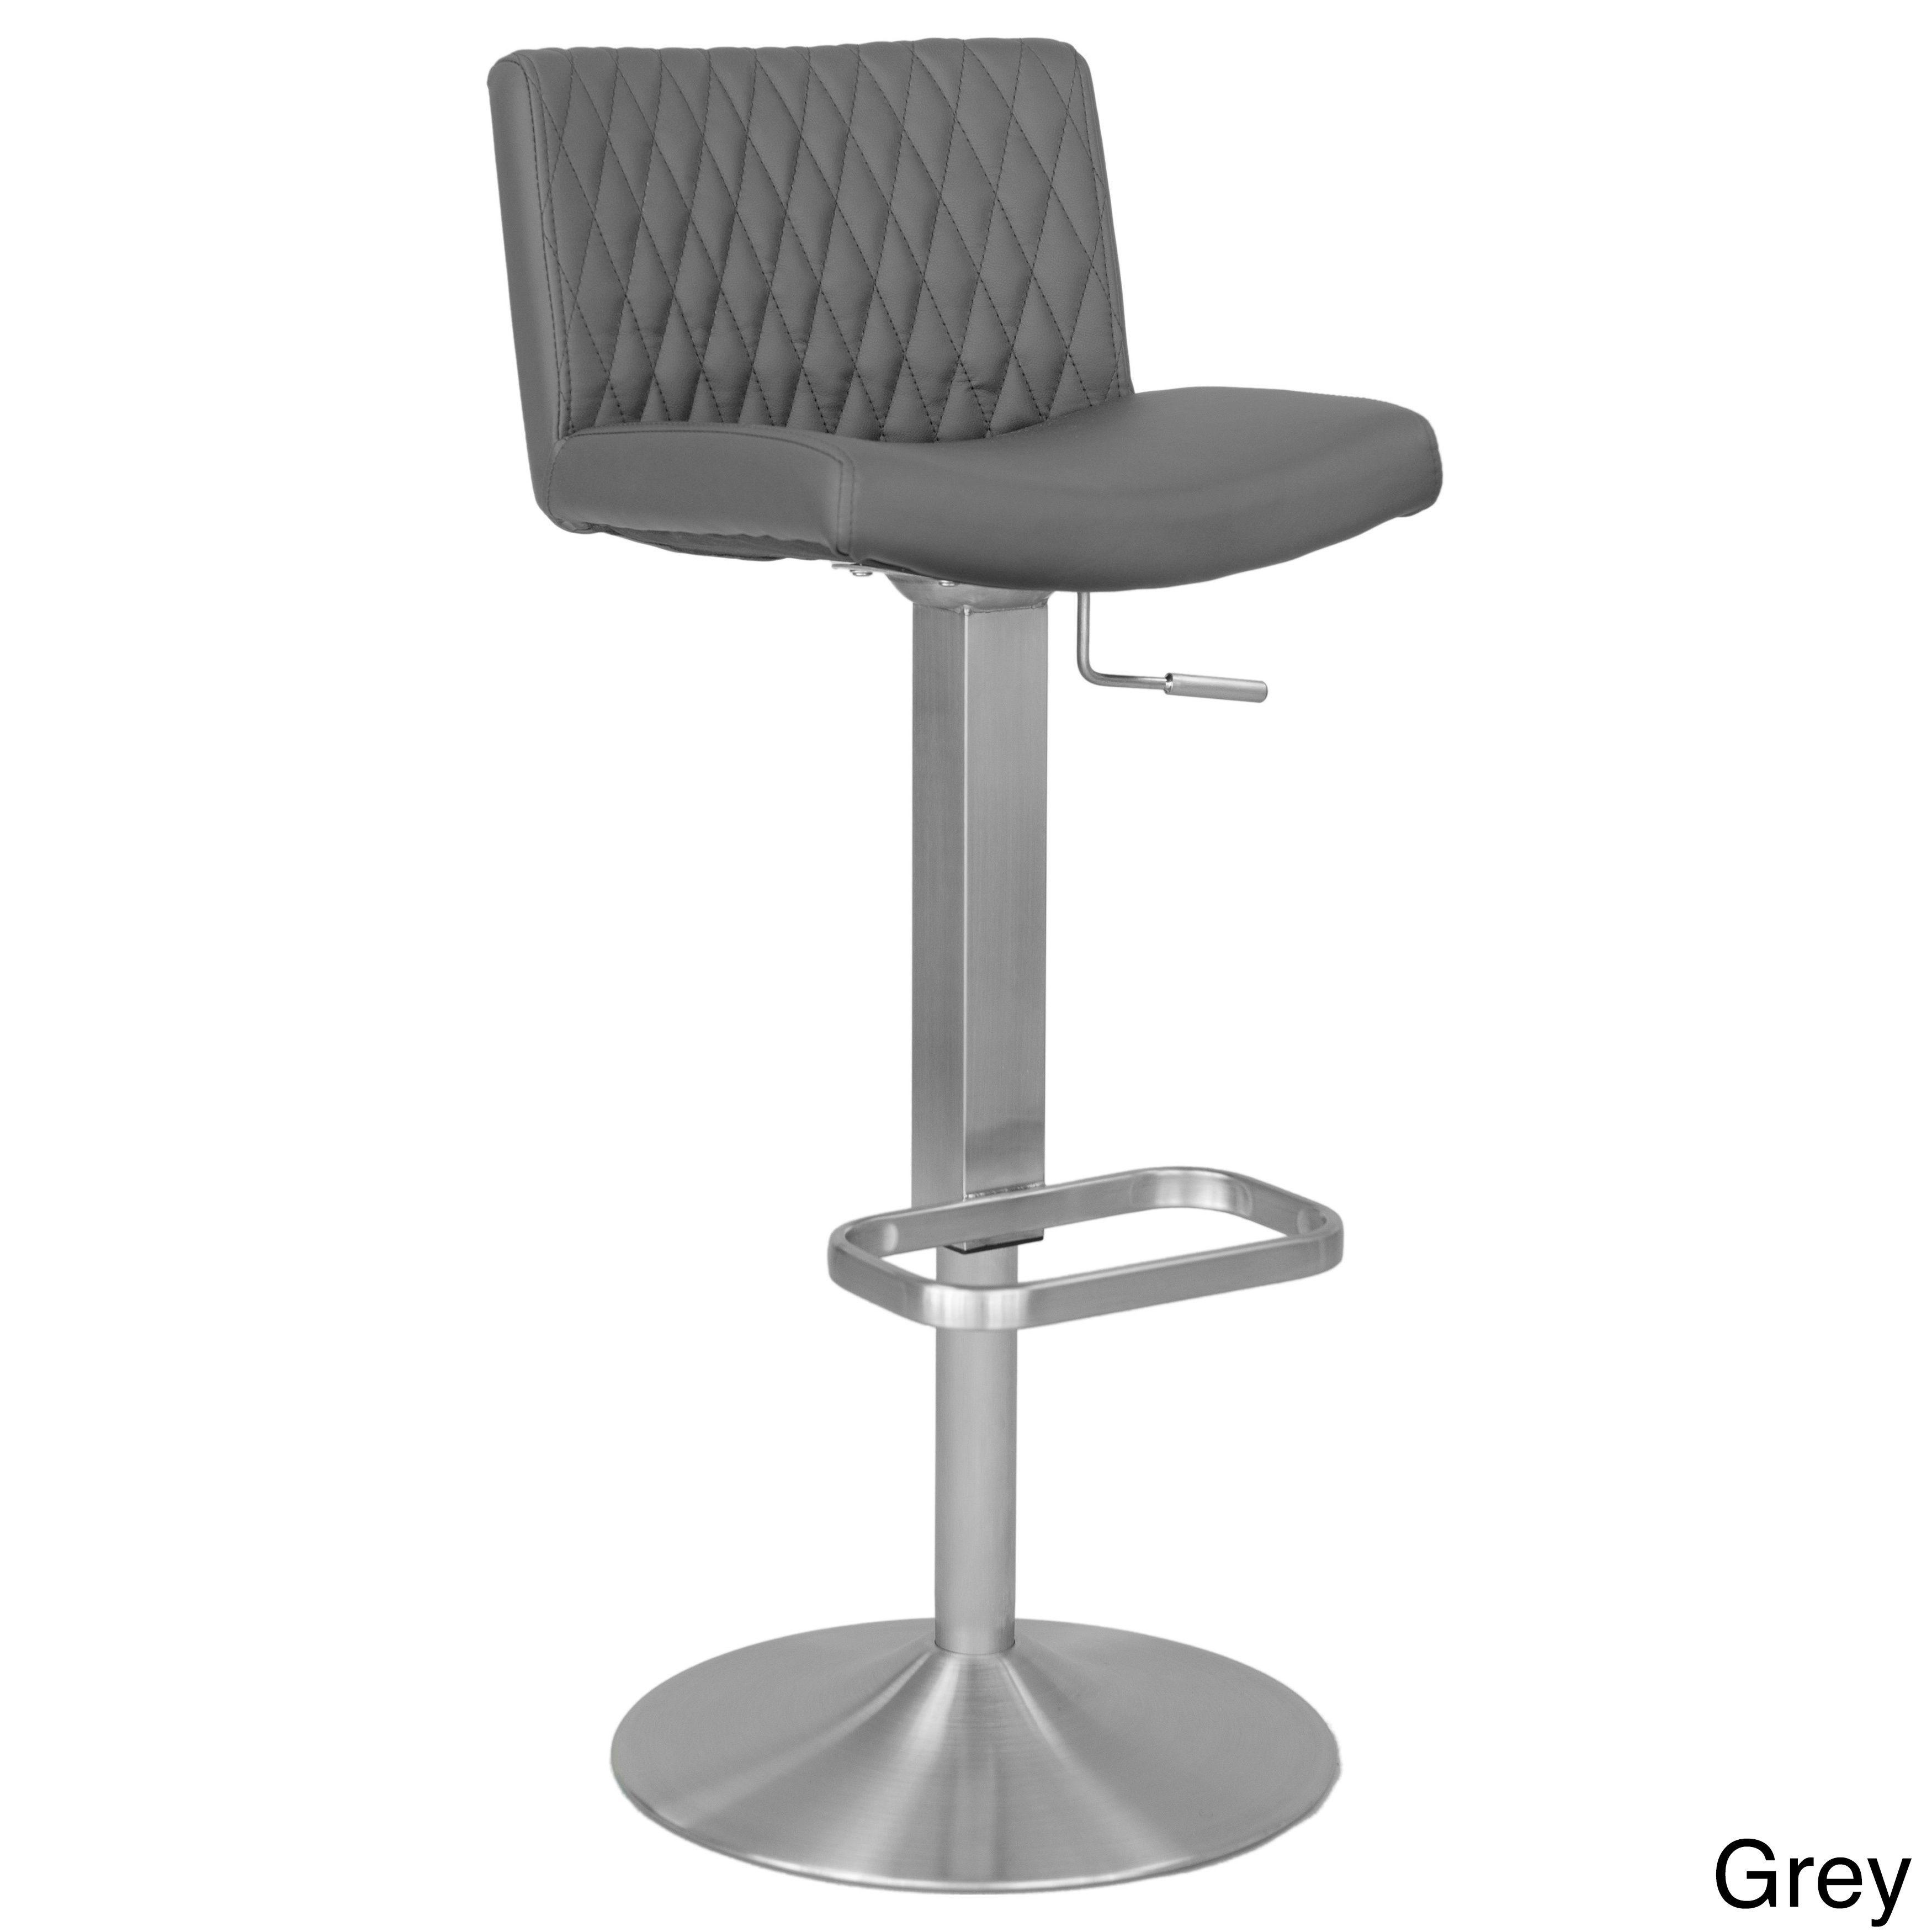 Stupendous Matrix Diamond Patterned Back Brushed Stainless Steel Ibusinesslaw Wood Chair Design Ideas Ibusinesslaworg